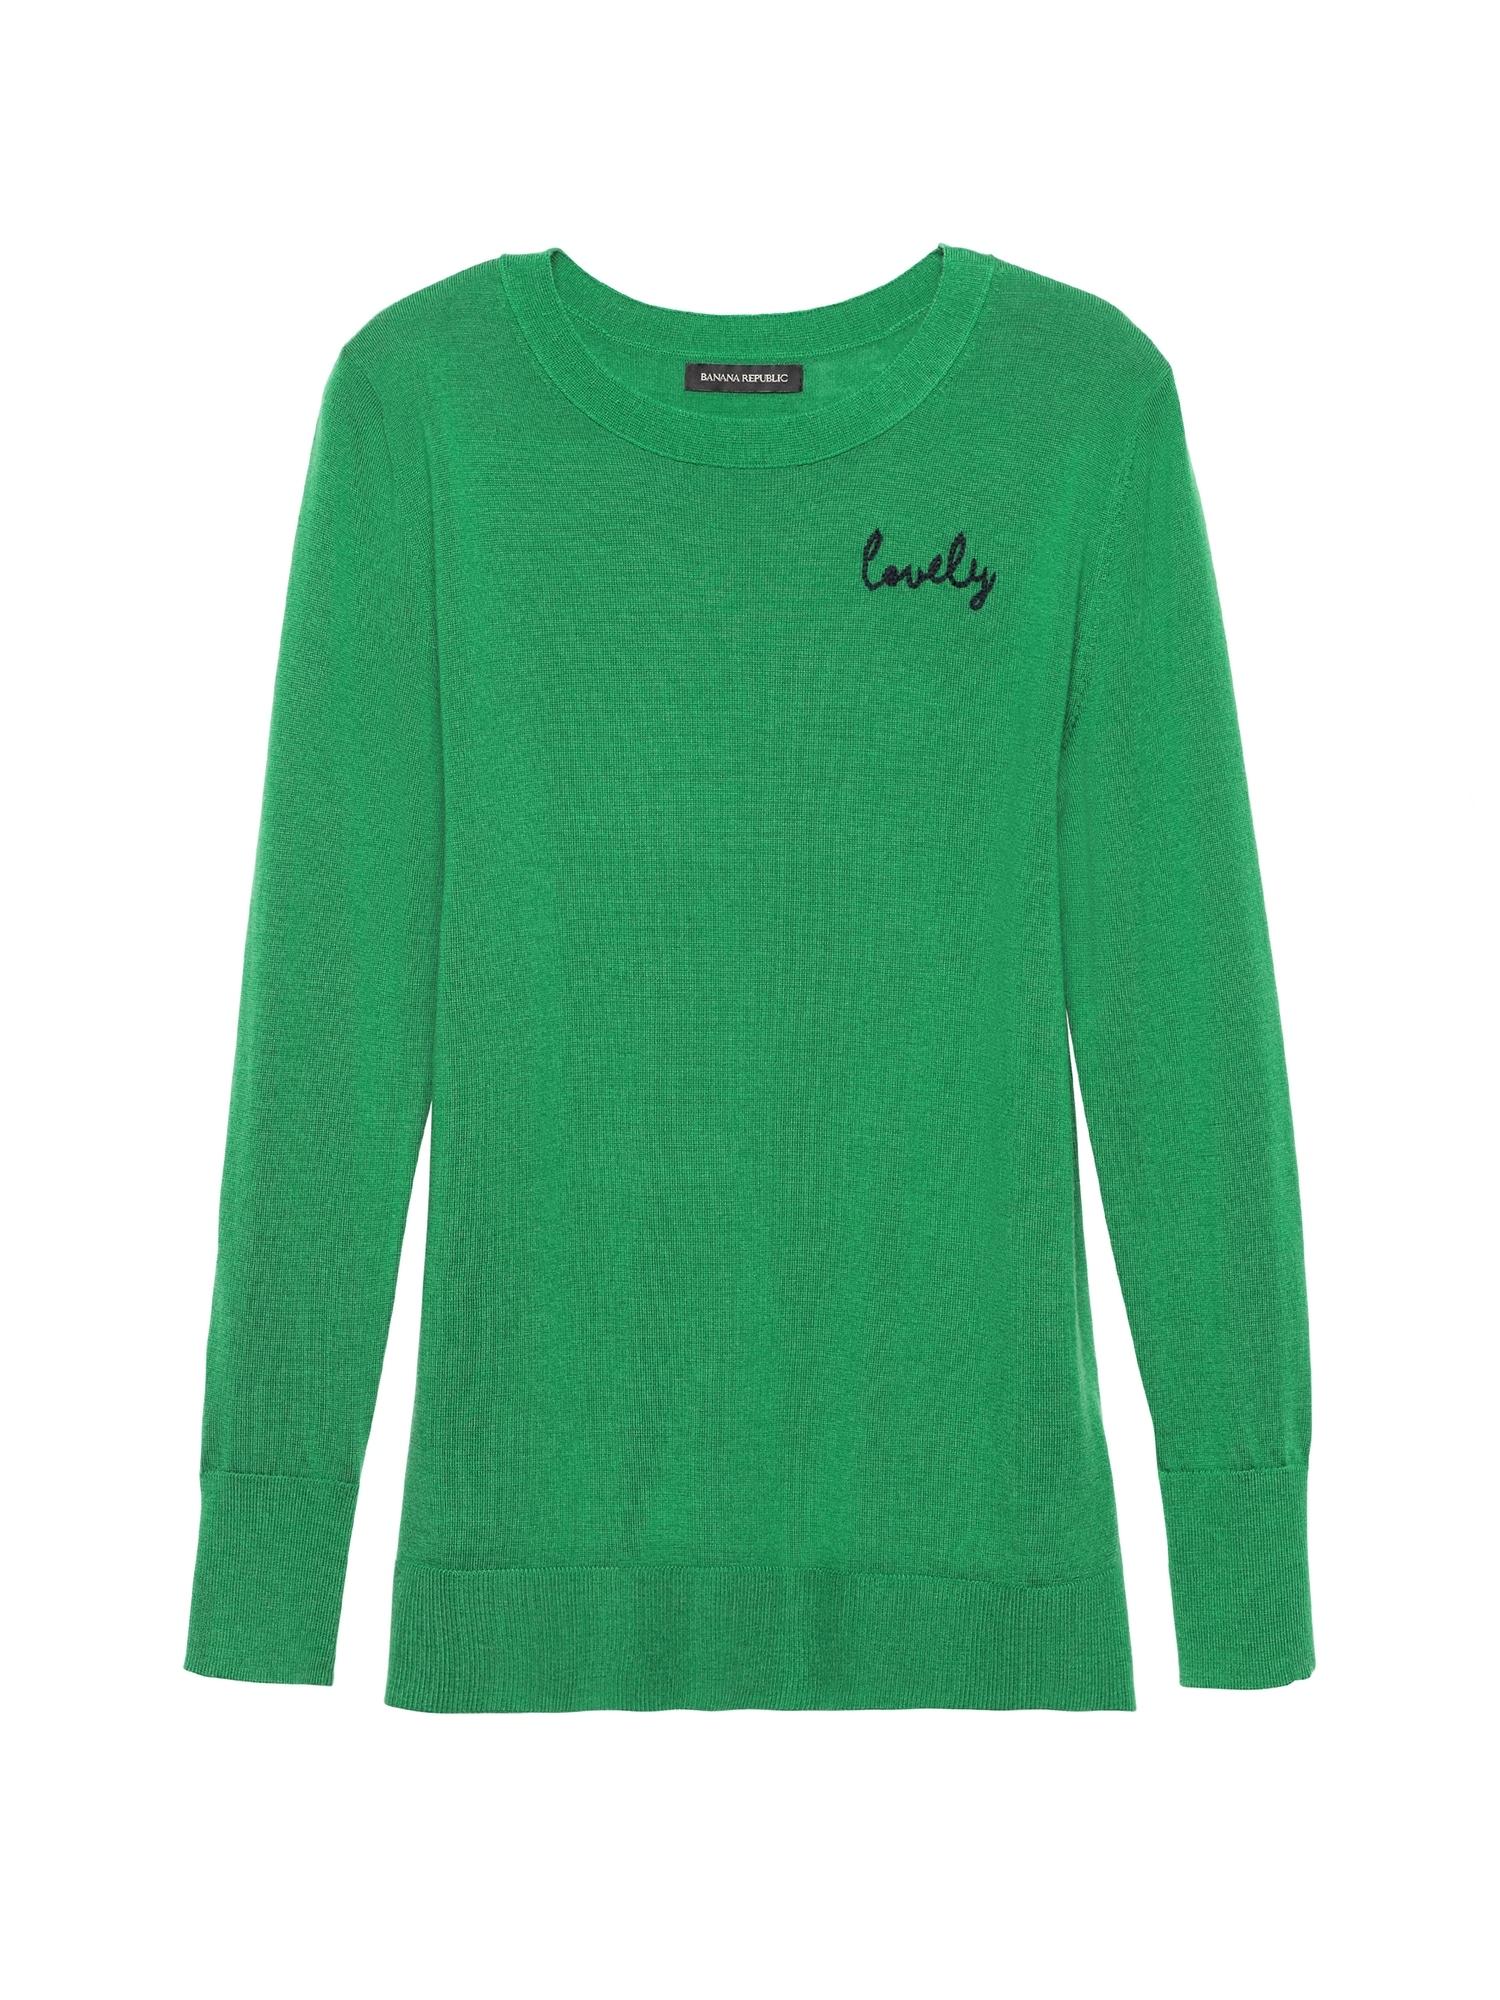 2efbff01ce1 Petite Machine-Washable Merino Crew Sweater with Embroidery